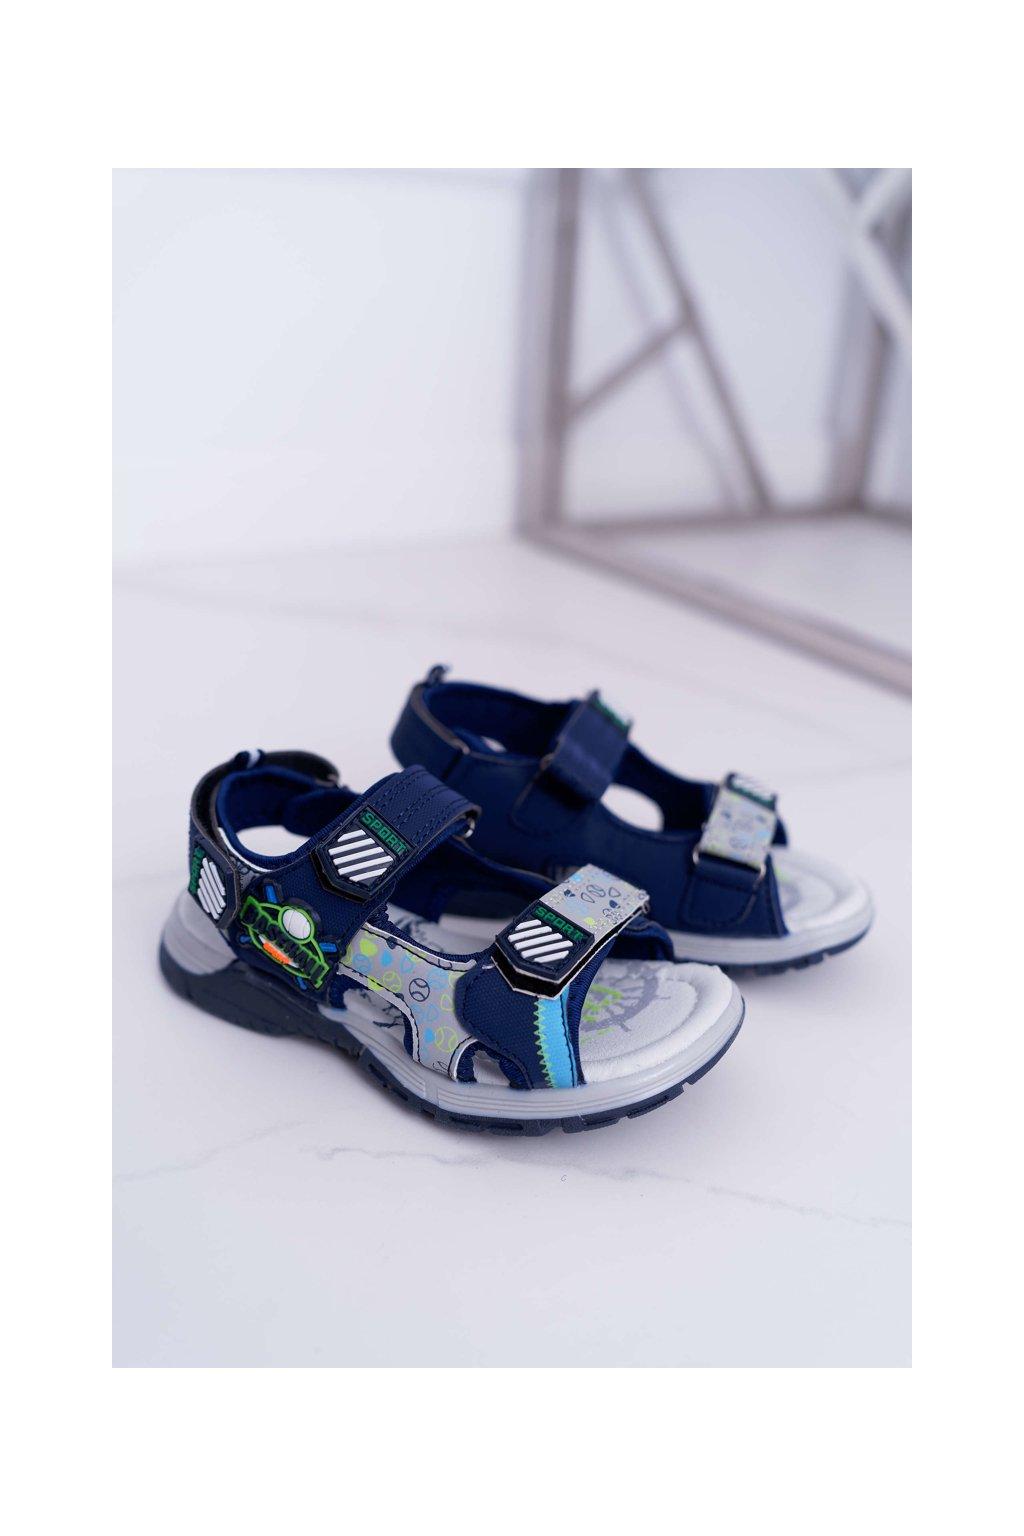 Detské chlapčenské Sandále na suchý zips tmavo modré Reksio